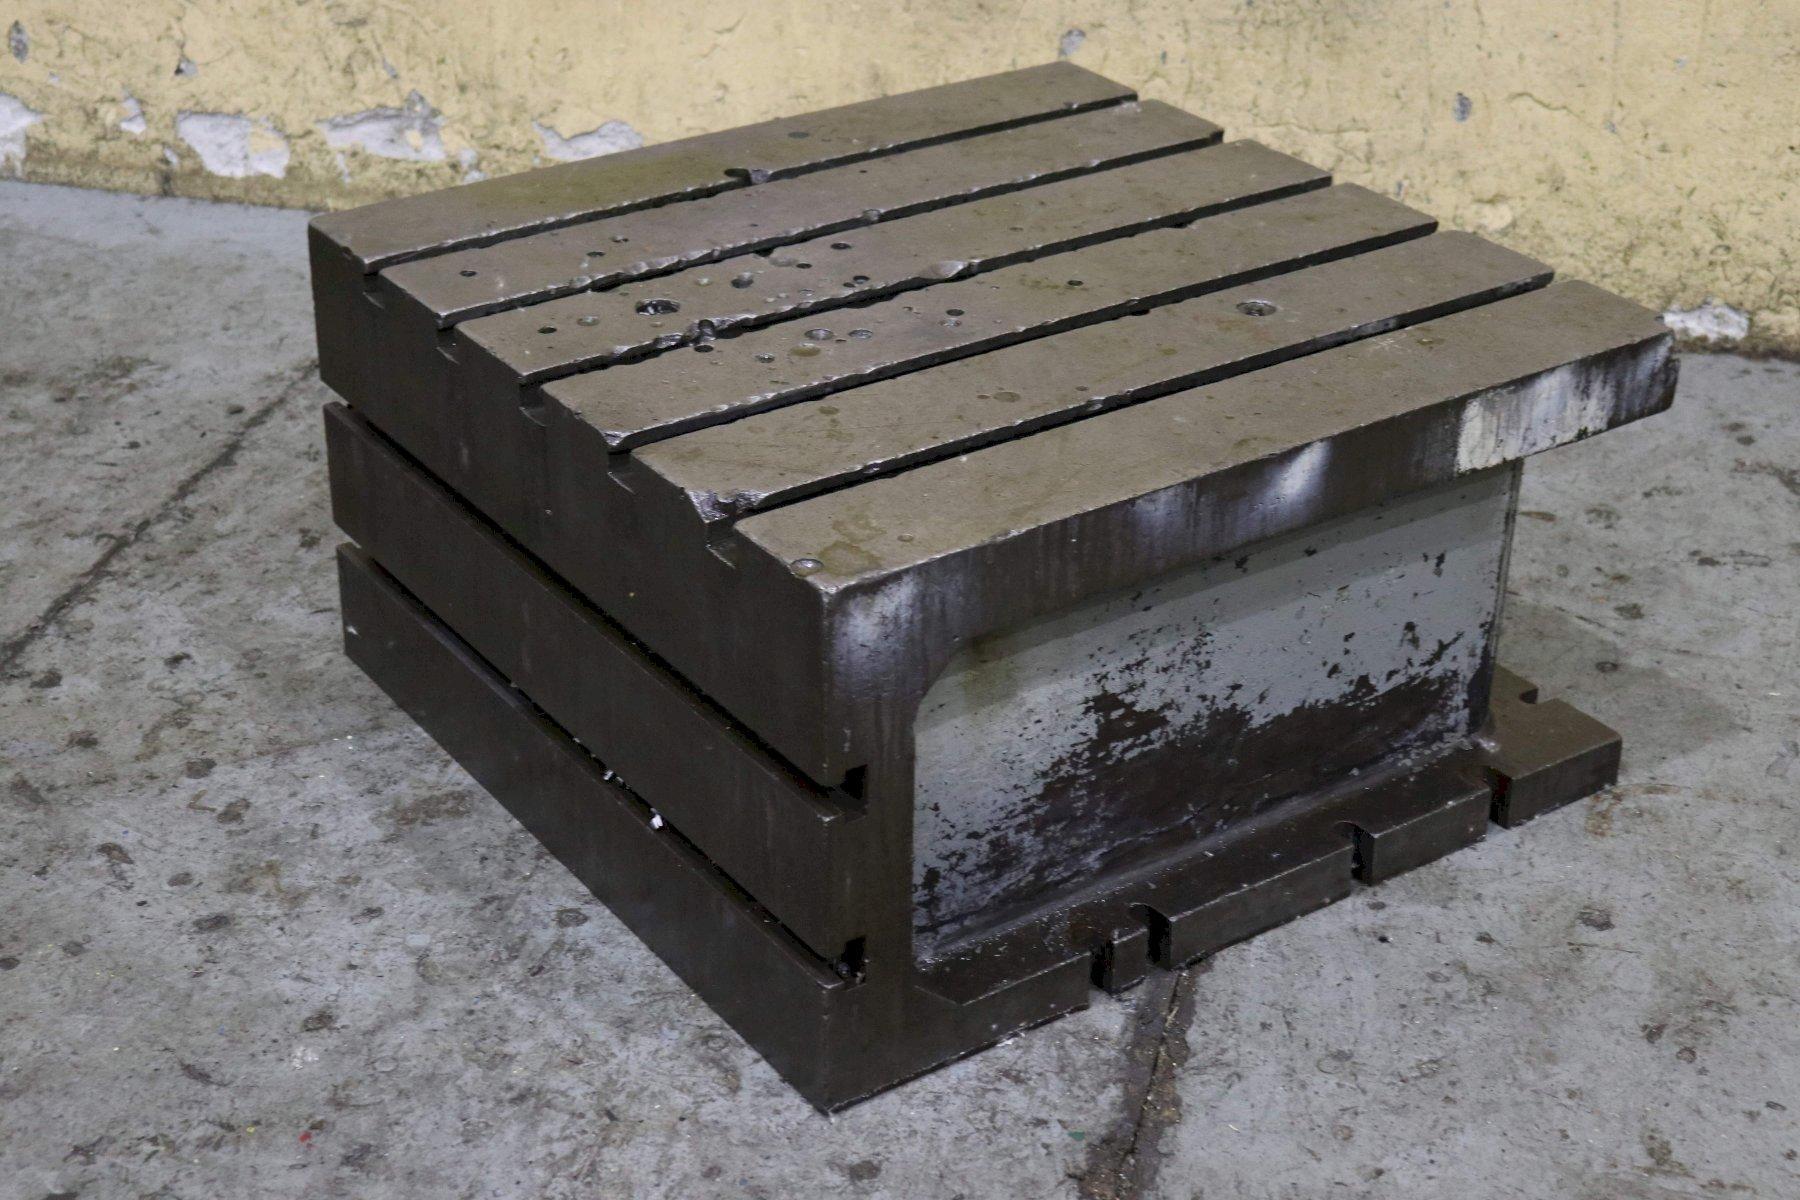 35' X 35' X 18' CUSTOM BOX DRILL TABLE: STOCK #73090